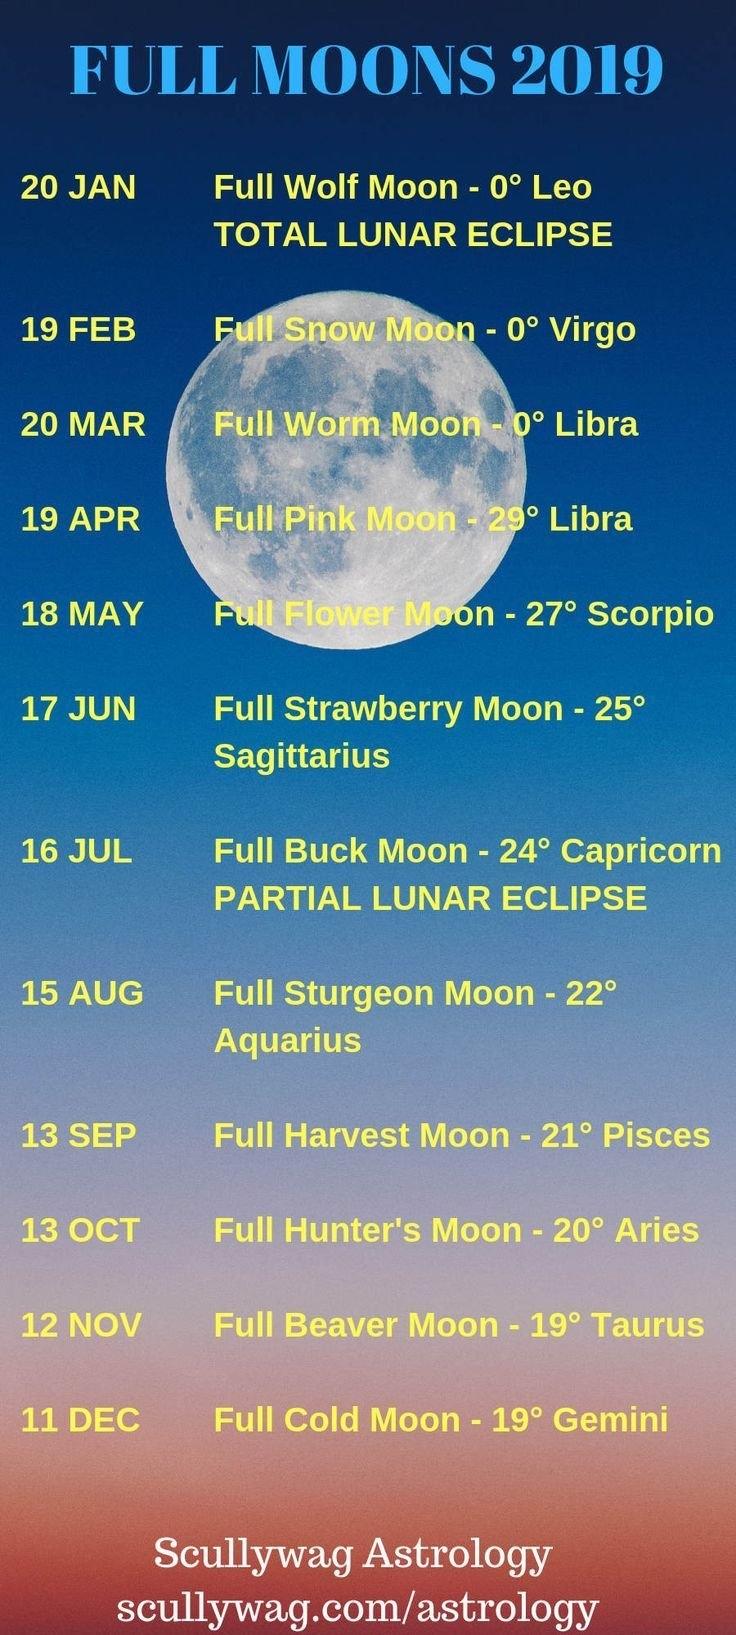 Moon Calendar 2019: What Date Is The Full Moon? Calendar 2019 Full Moon